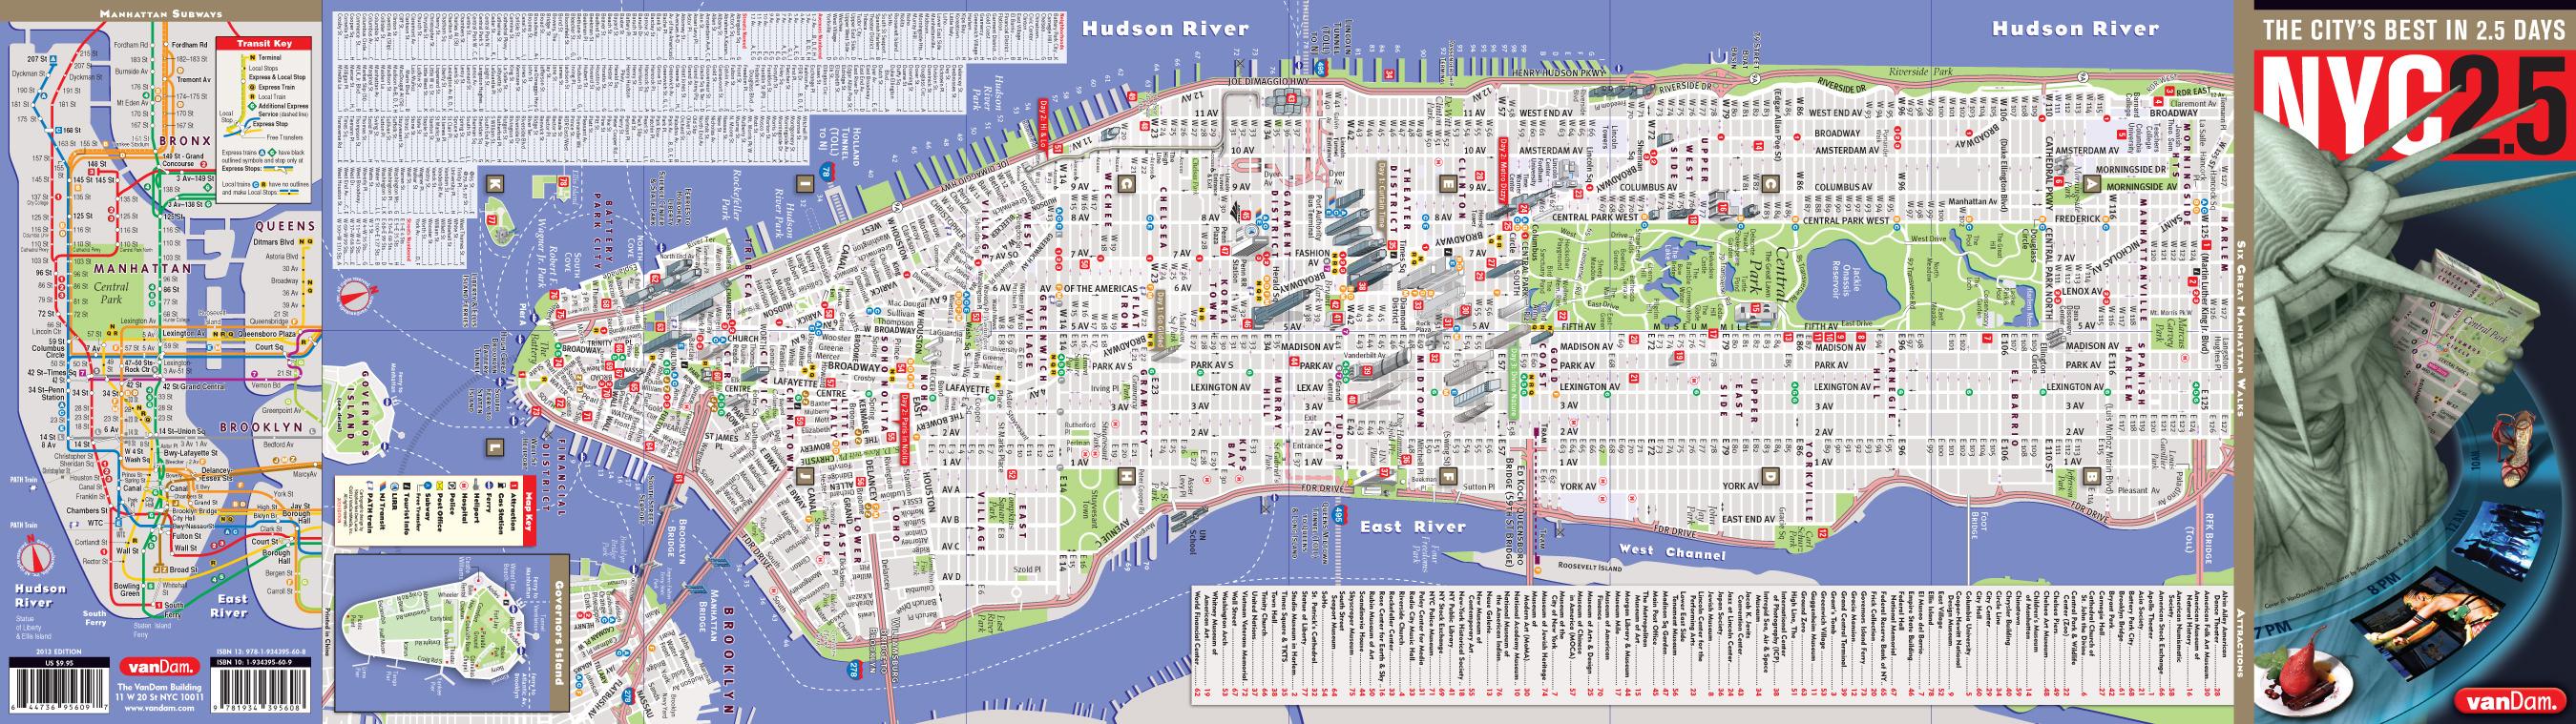 New York City Map By VanDam NYC  StreetSmart Map City - Nyc unfolds map